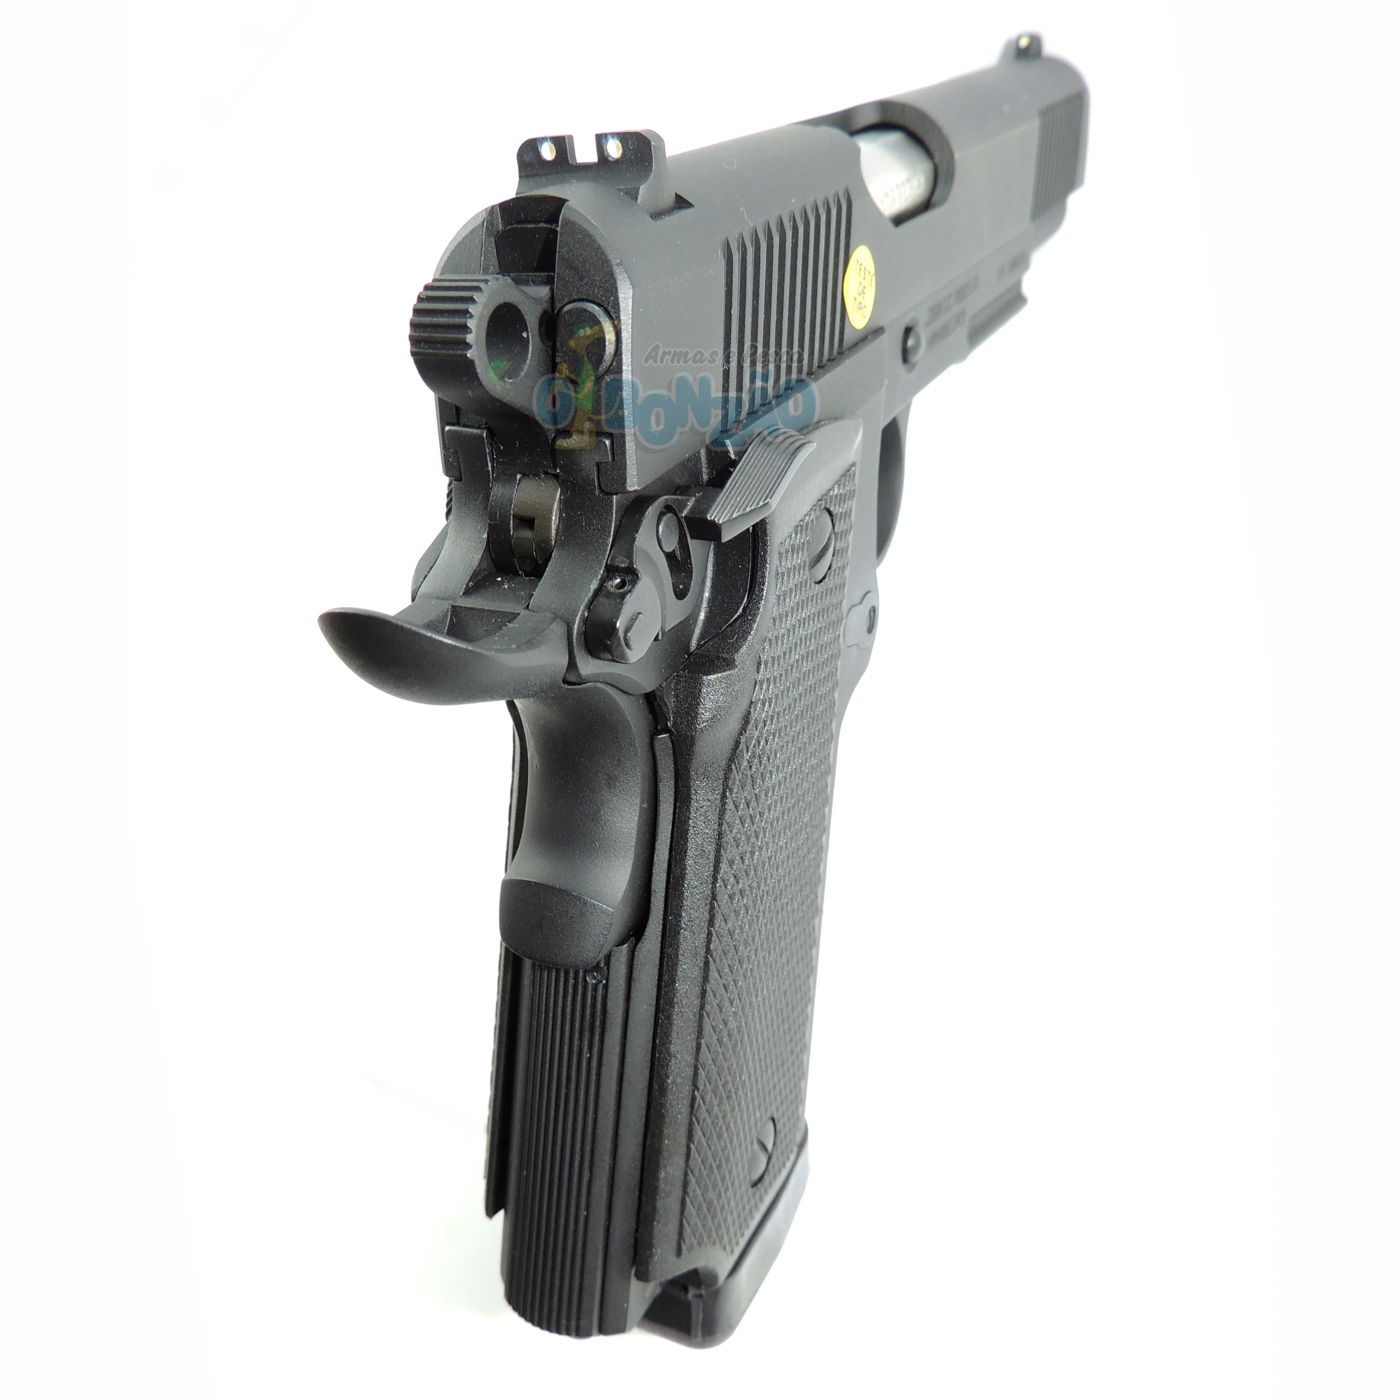 Pistola Imbel MD2 LX GC ADC Cal .380 ACP 19+1 Tiros Oxidada